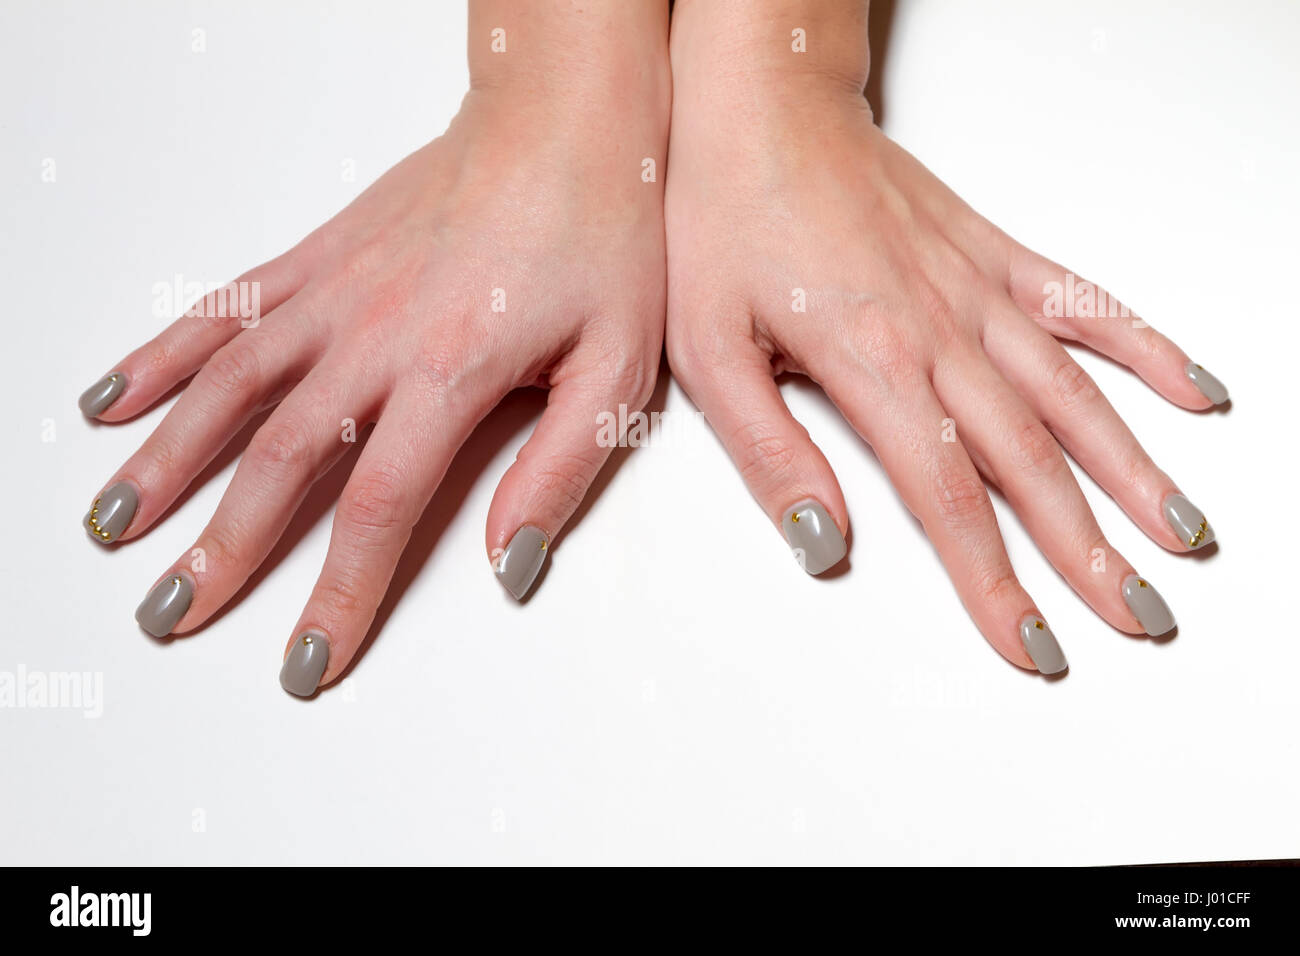 Manicure - Beauty treatment photo of nice manicured fingernails ...